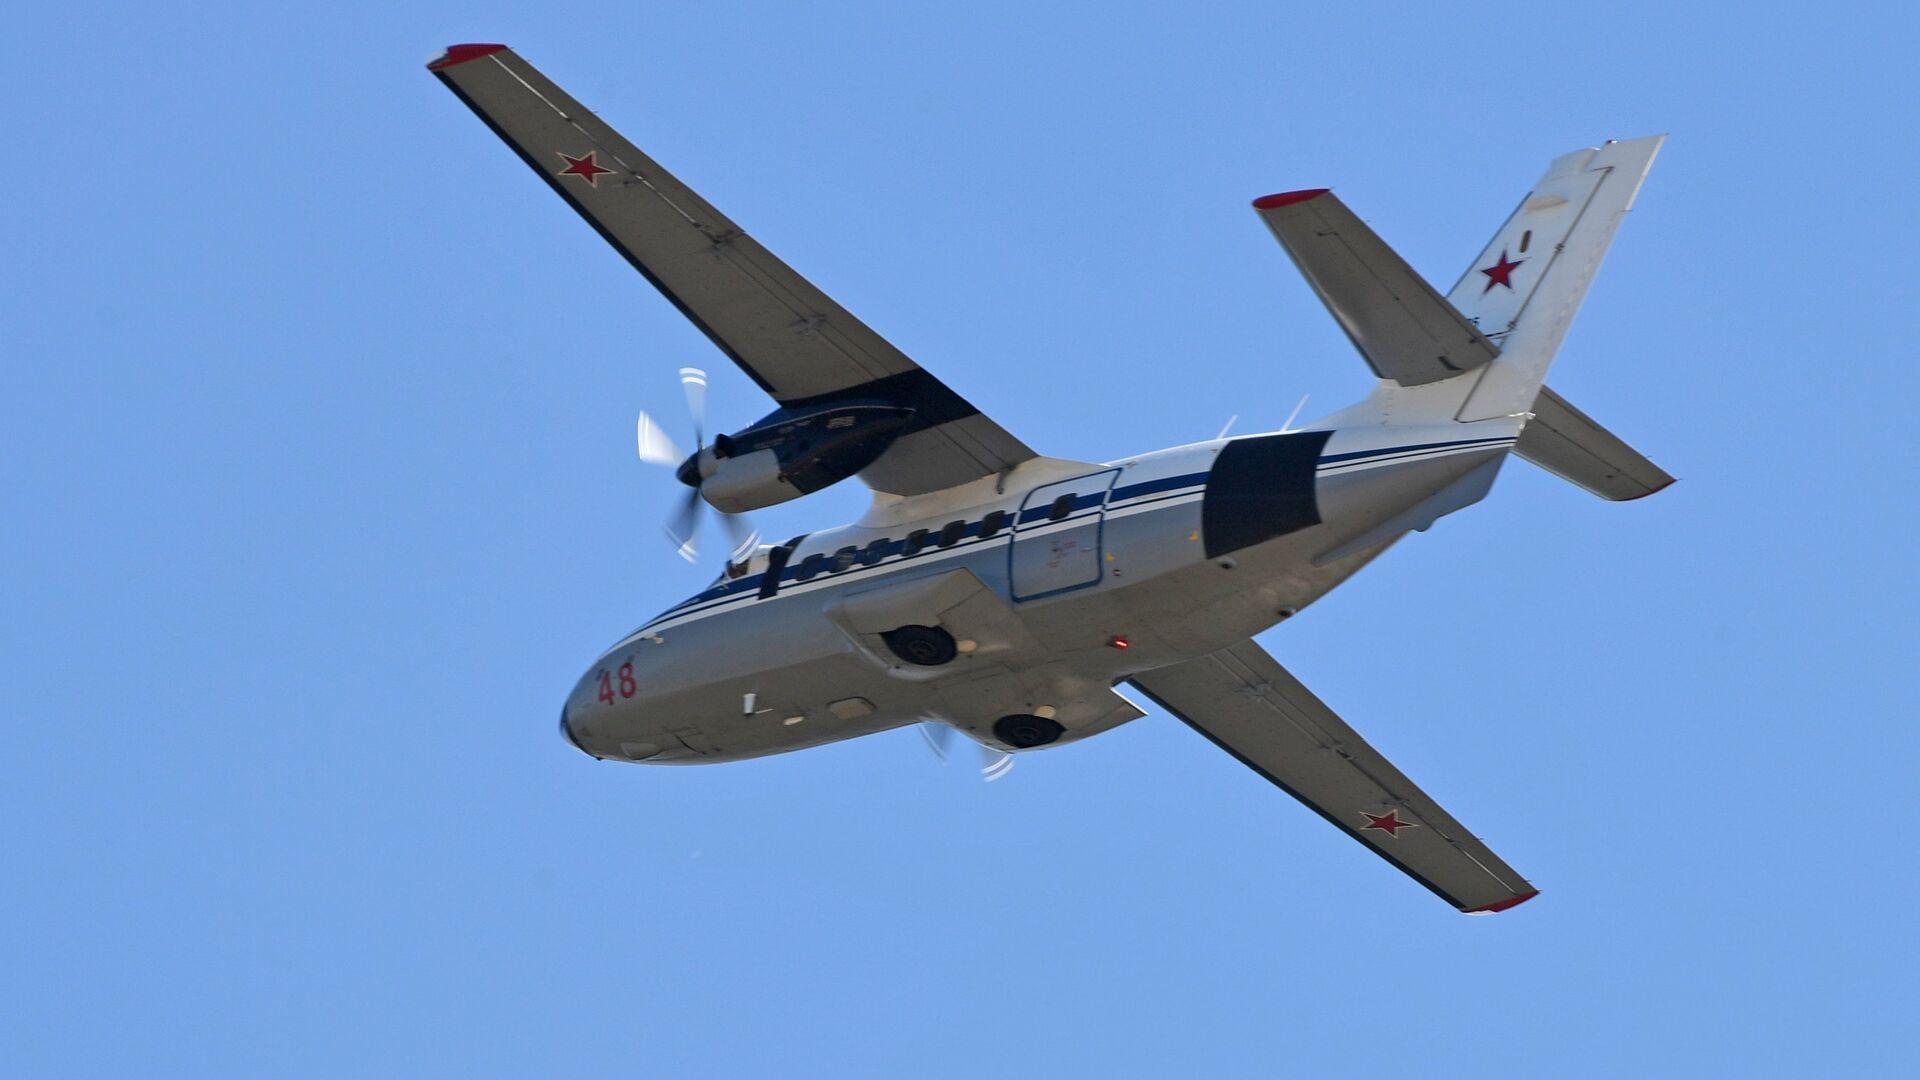 Un avión L-410  (archivo) - Sputnik Mundo, 1920, 19.06.2021